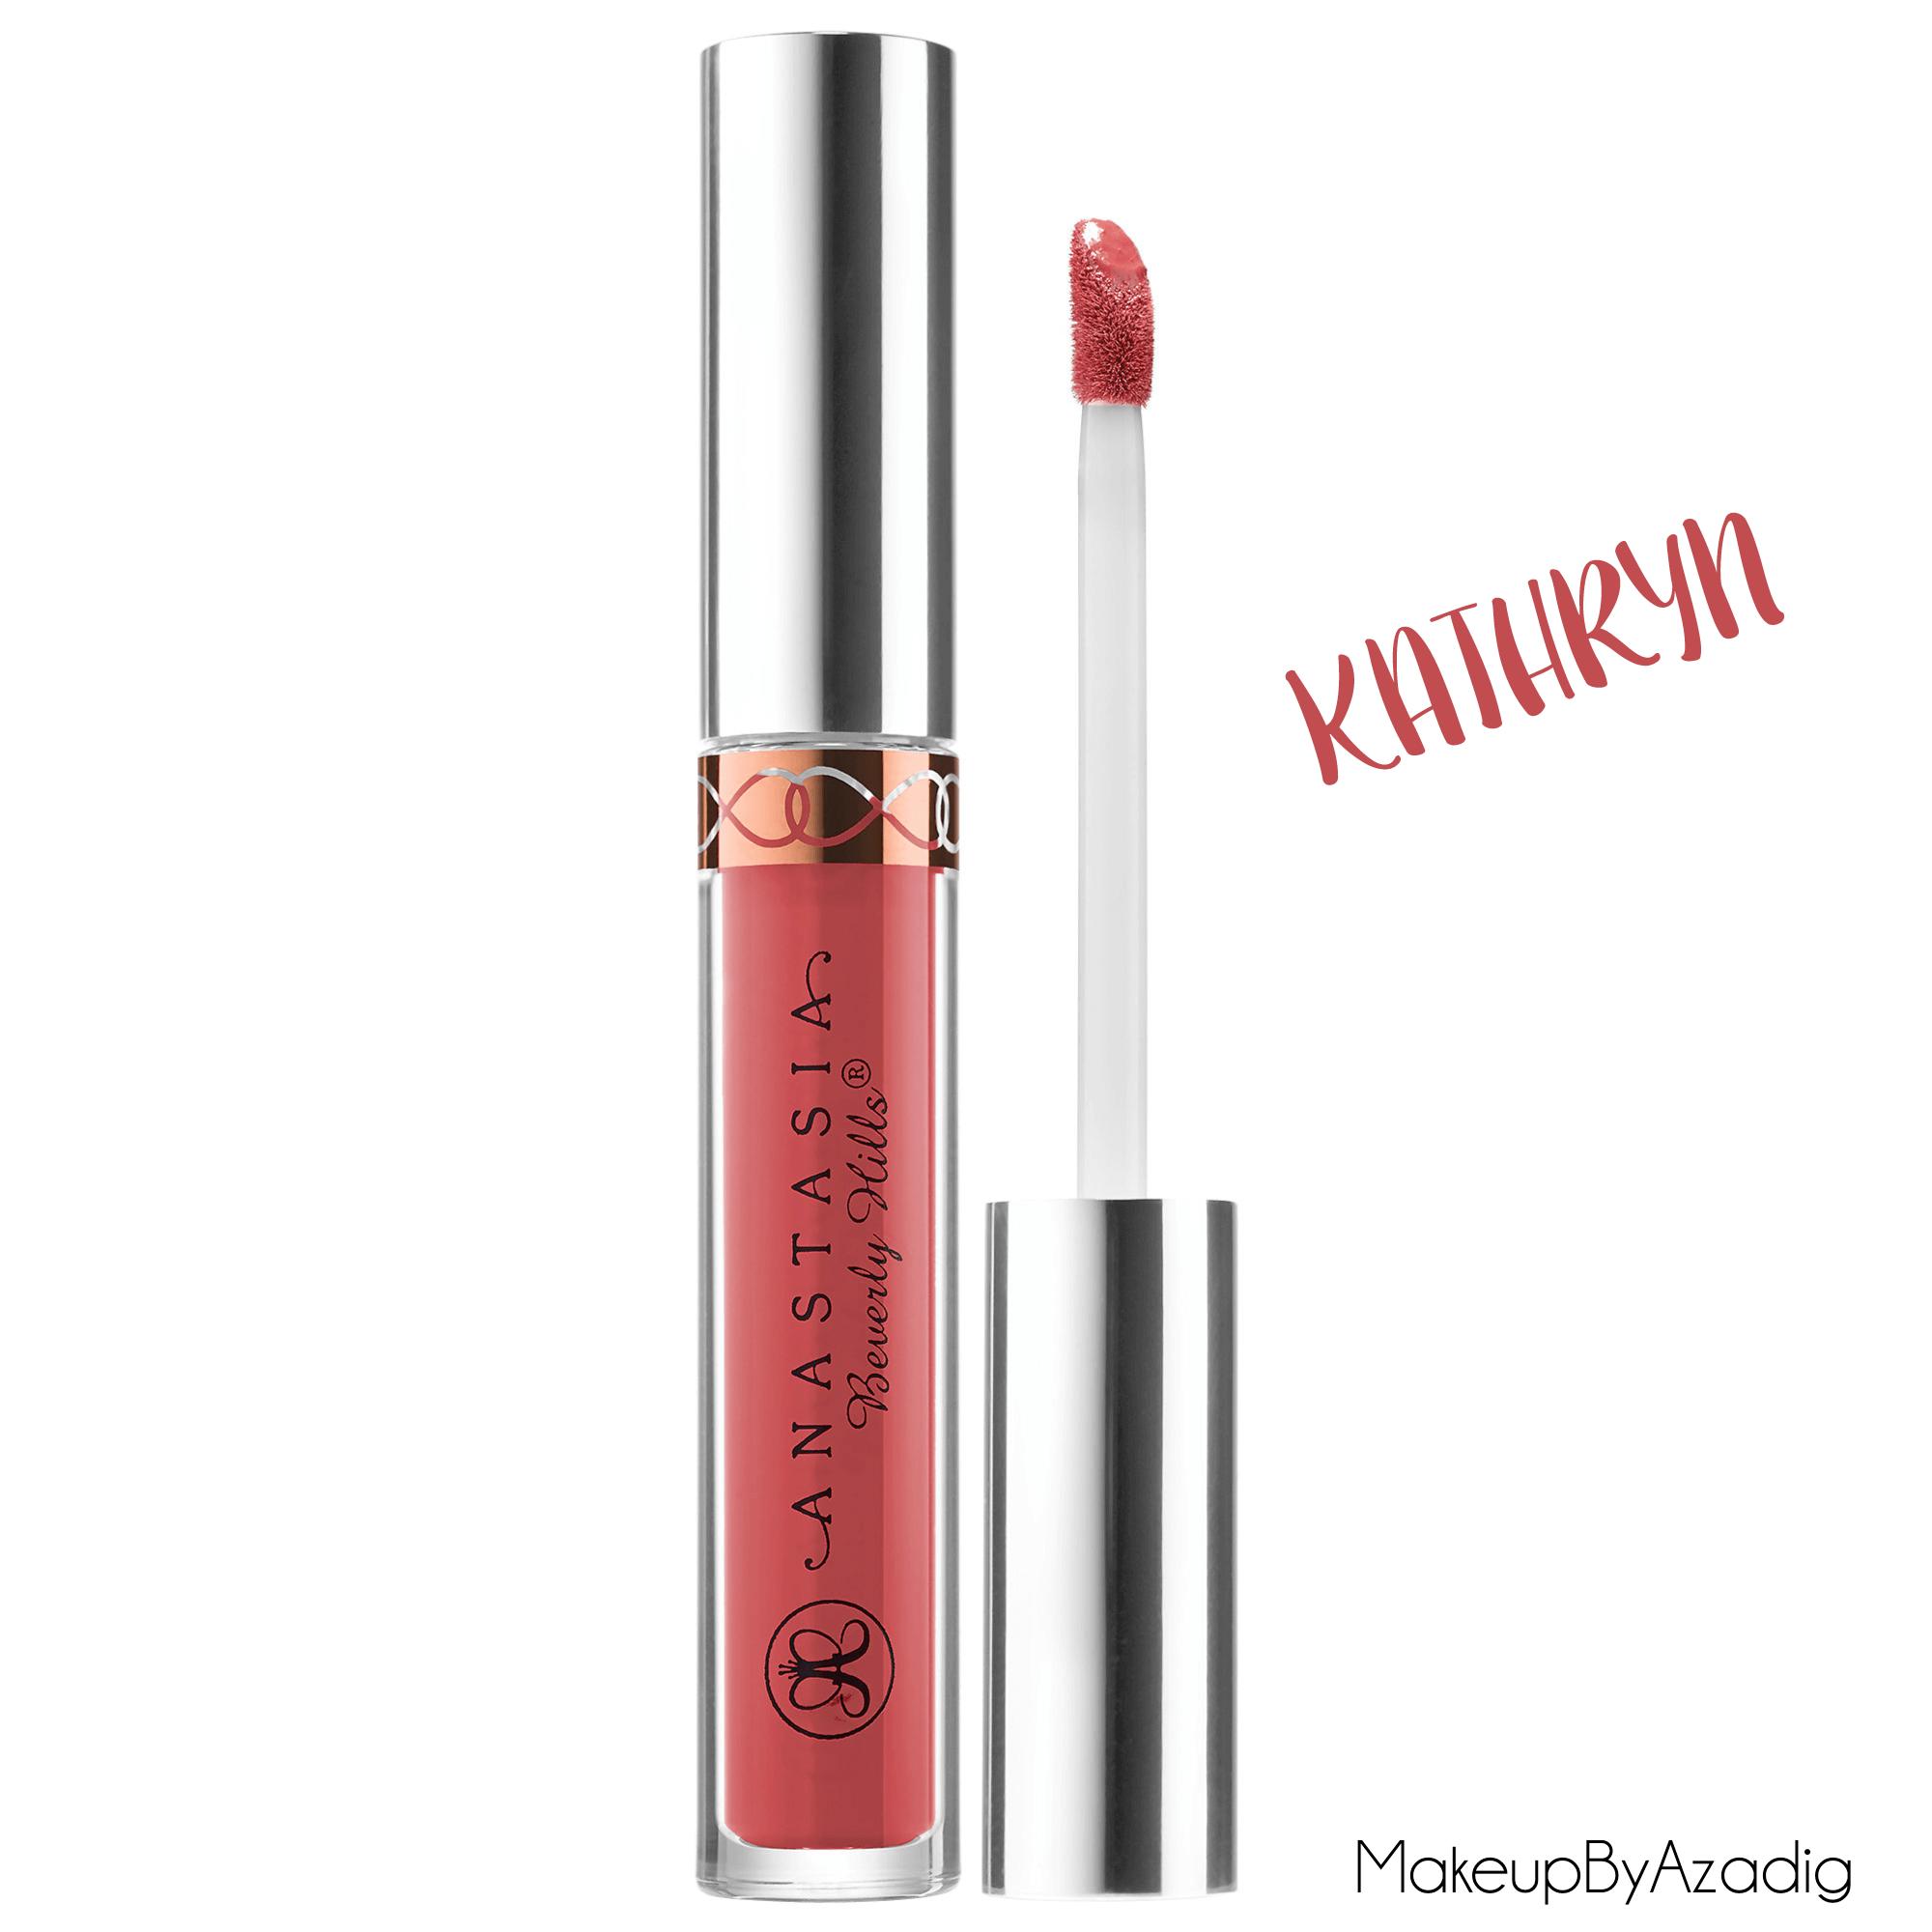 makeupbyazadig--anastasia-beverly-hills---france---sephora---liquid-lipstick---modern-renaissance---brow-powder--kathryn